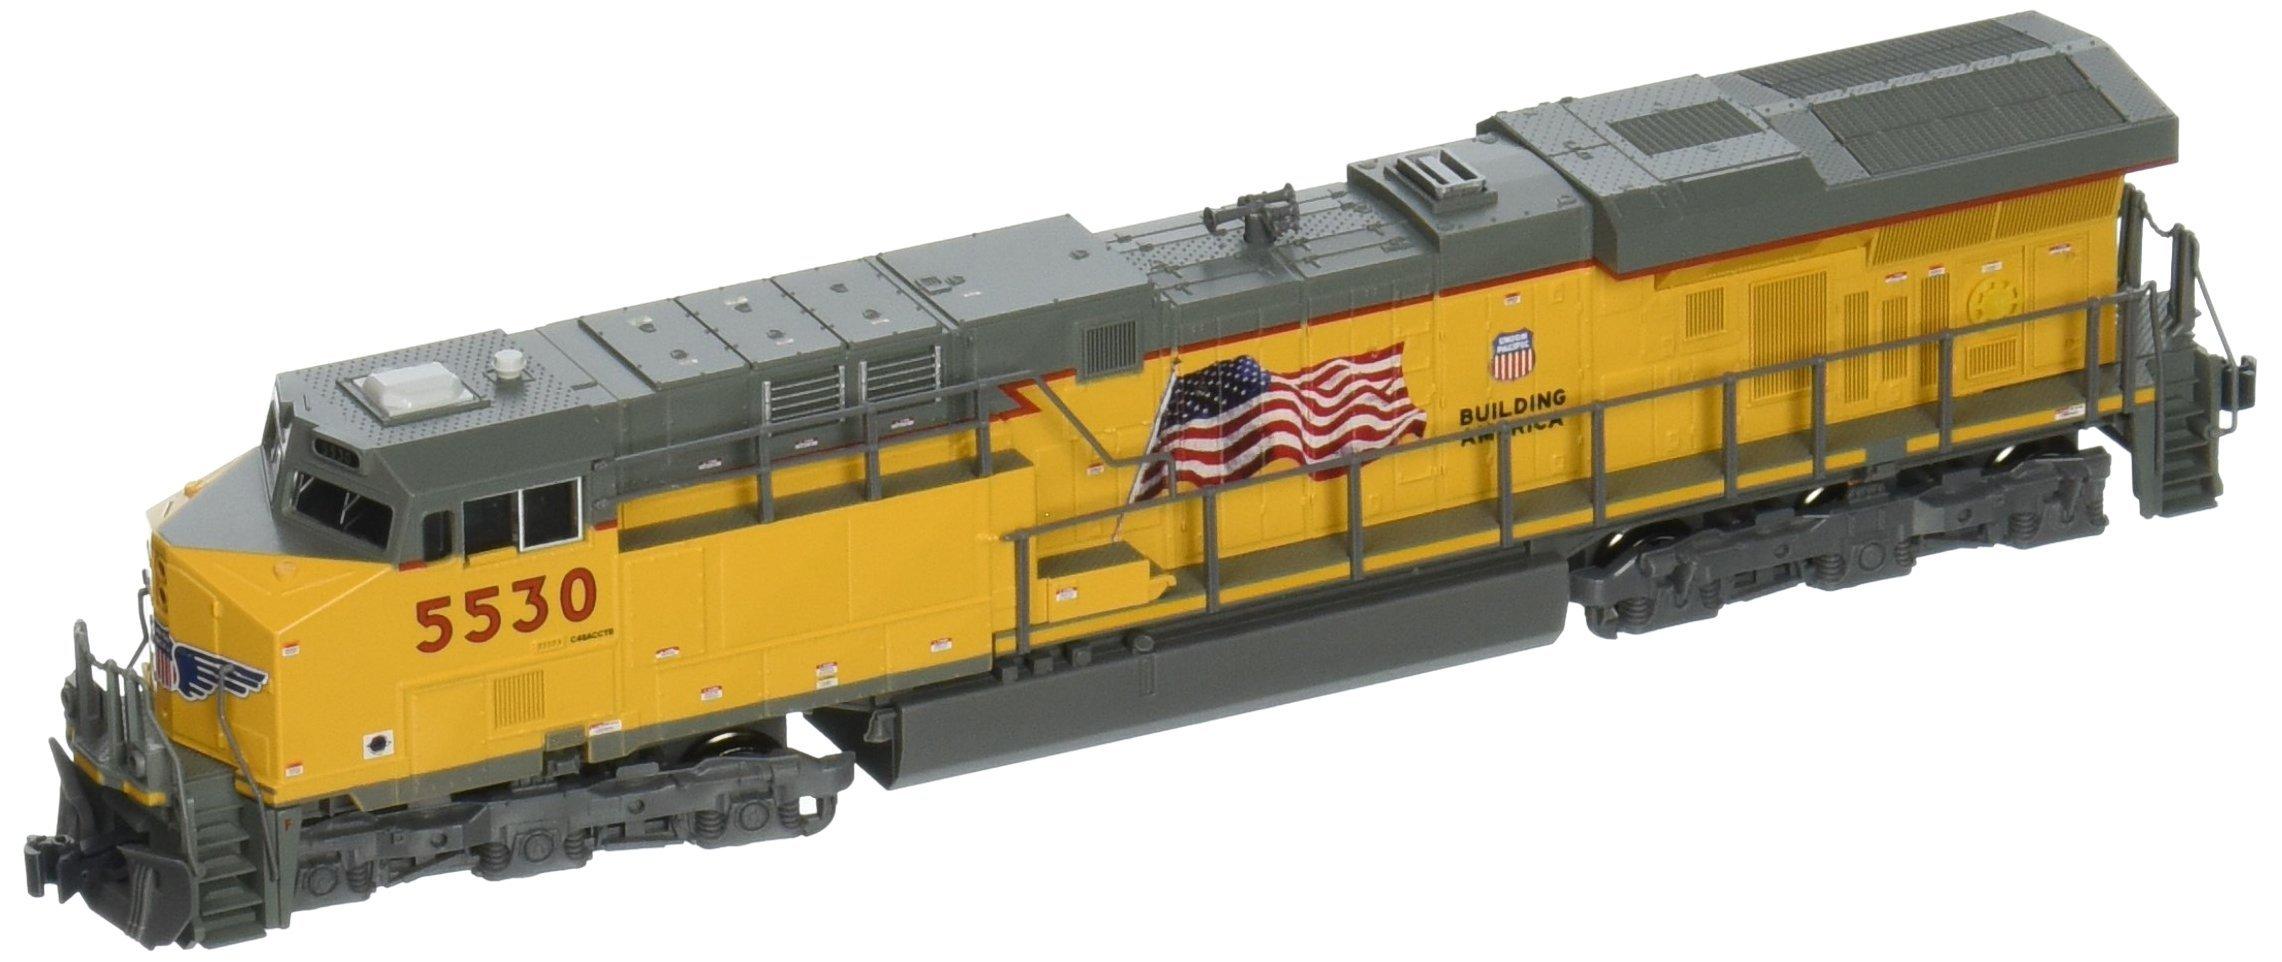 Kato USA Model Train Products N GE ES44AC ''Gevo'' Union Pacific Locomotive #5530 Train